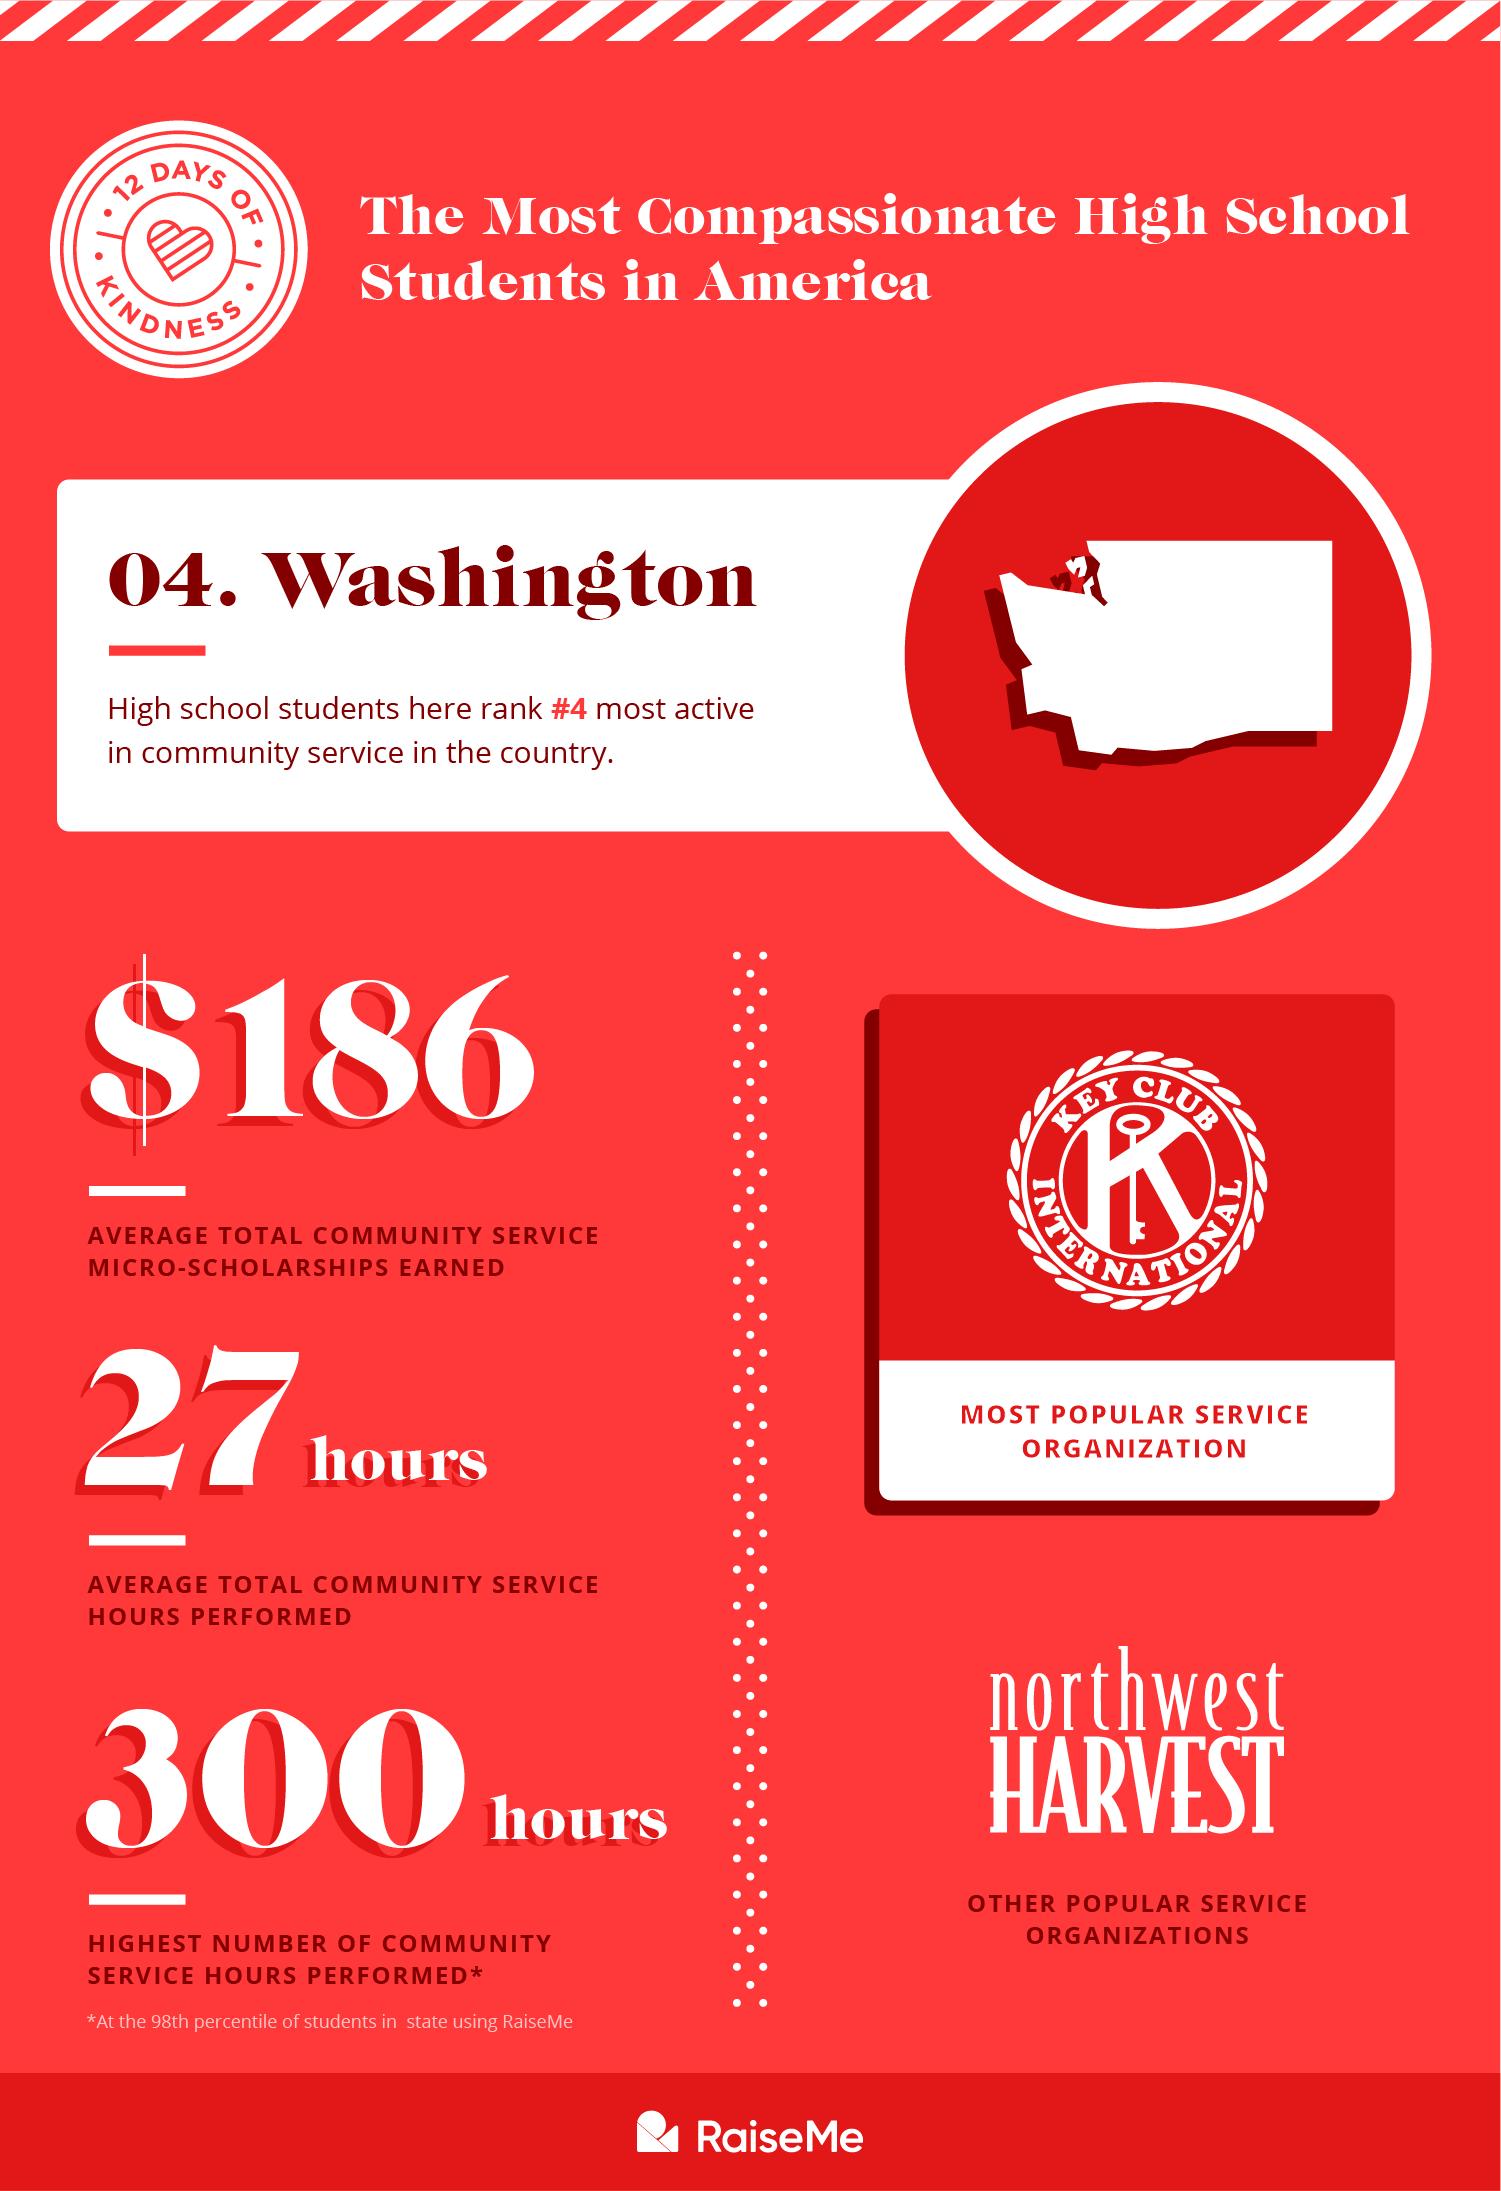 #4 Washington